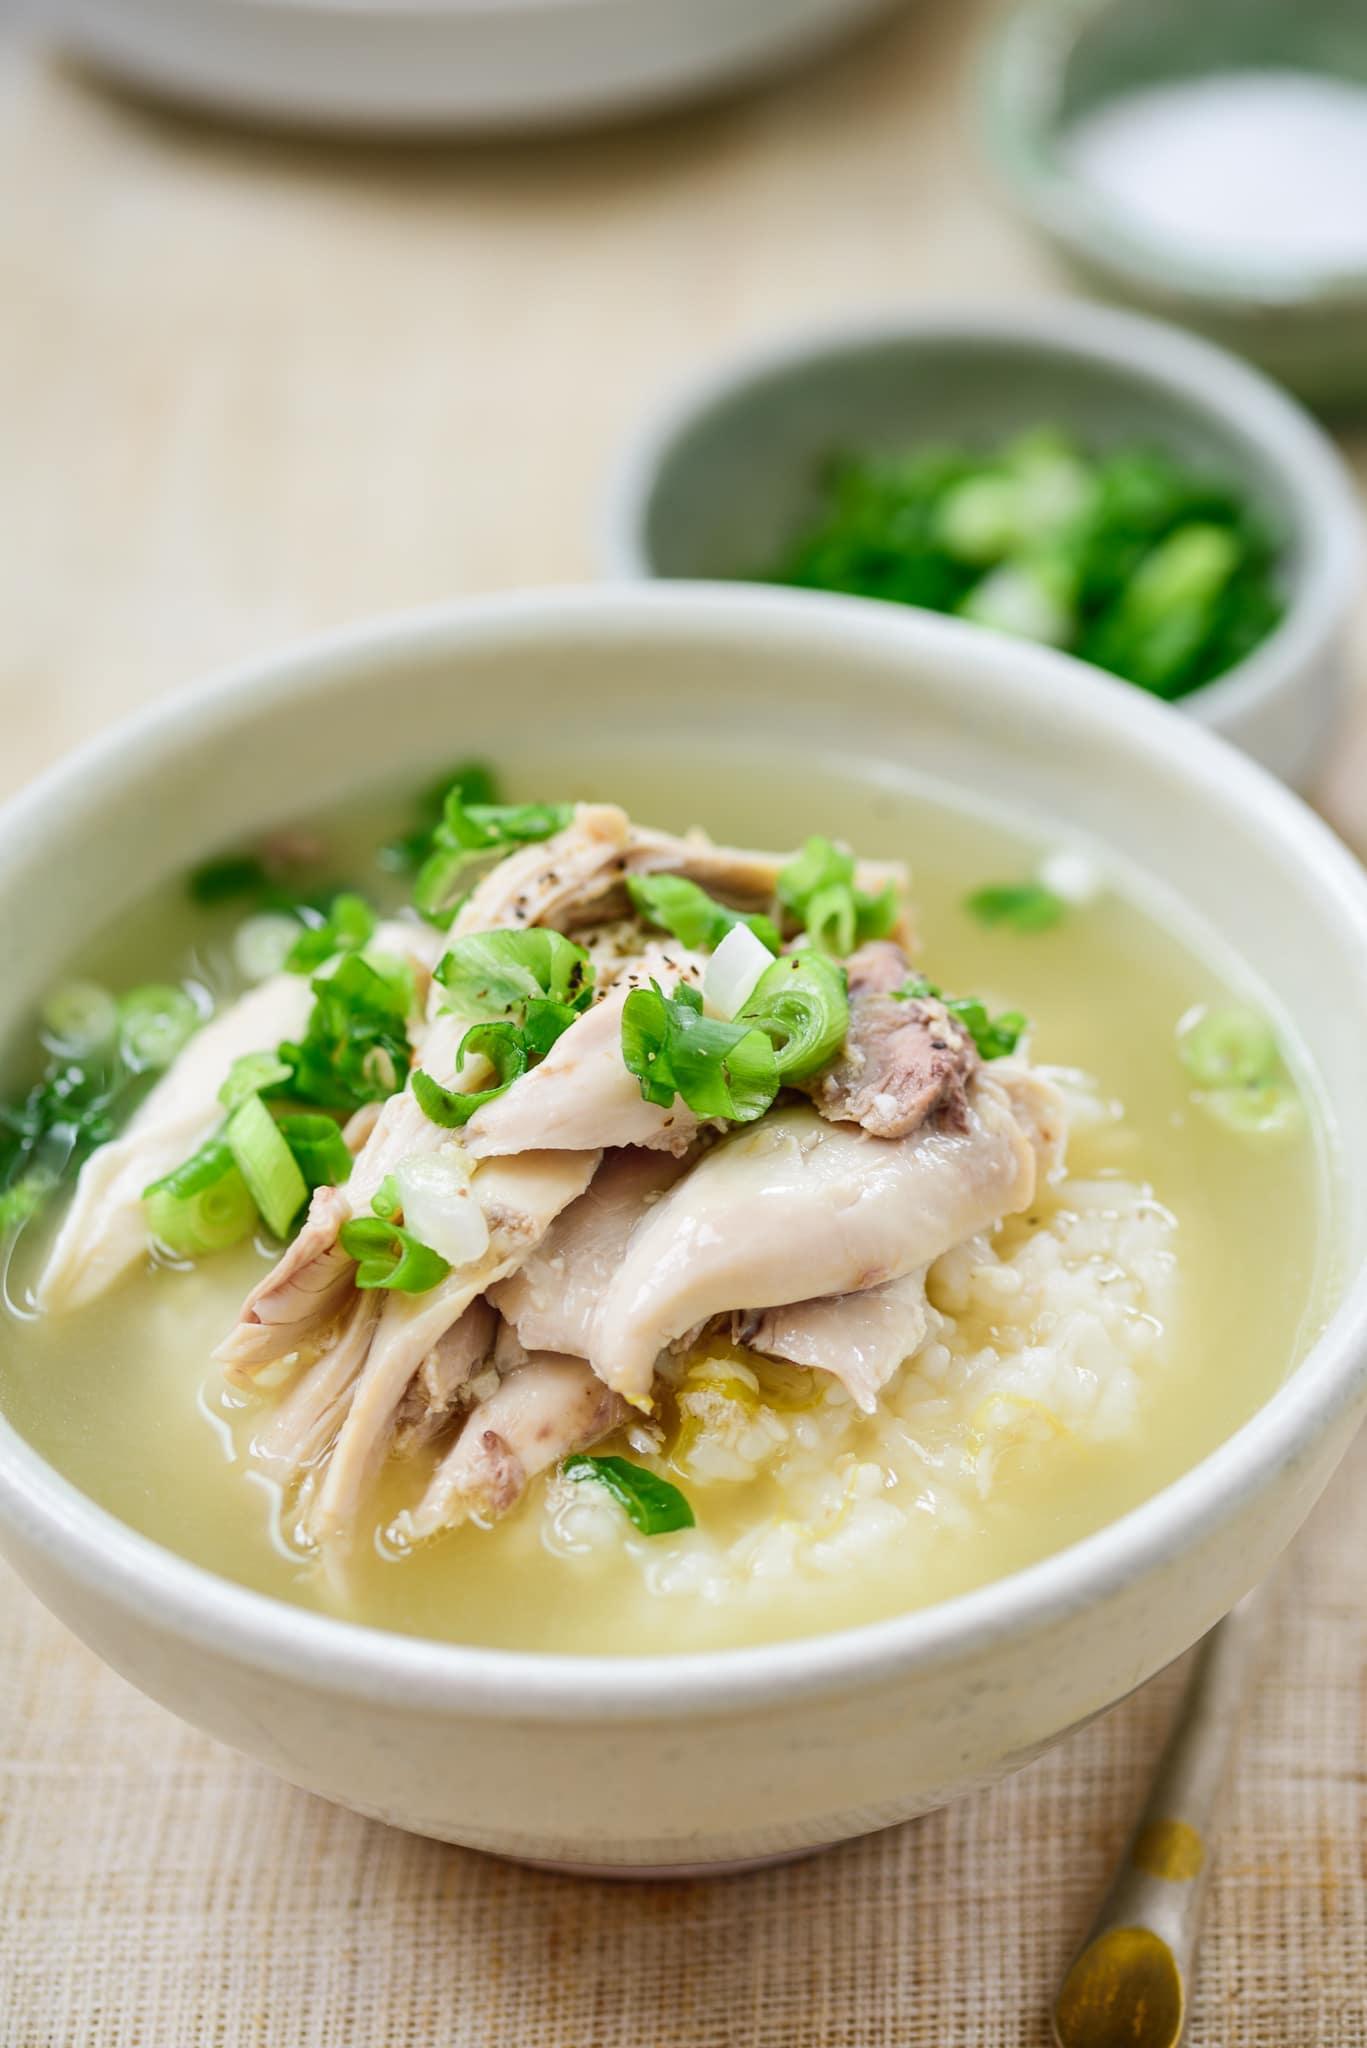 DSC2686 - Dak Gomtang (Korean Chicken Soup)